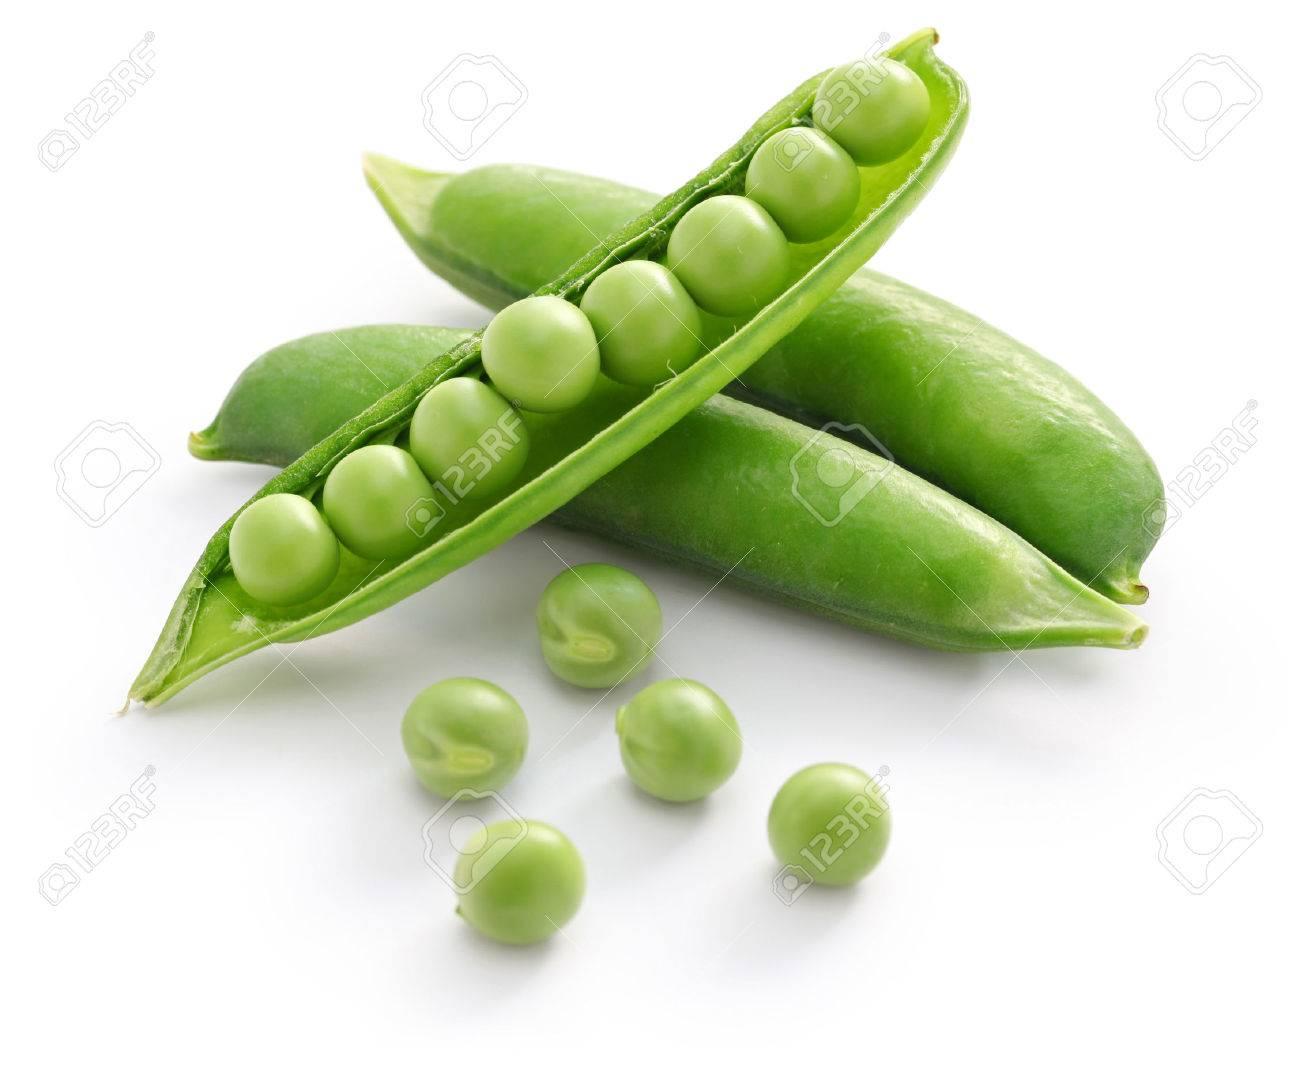 green peas Stock Photo - 53020891